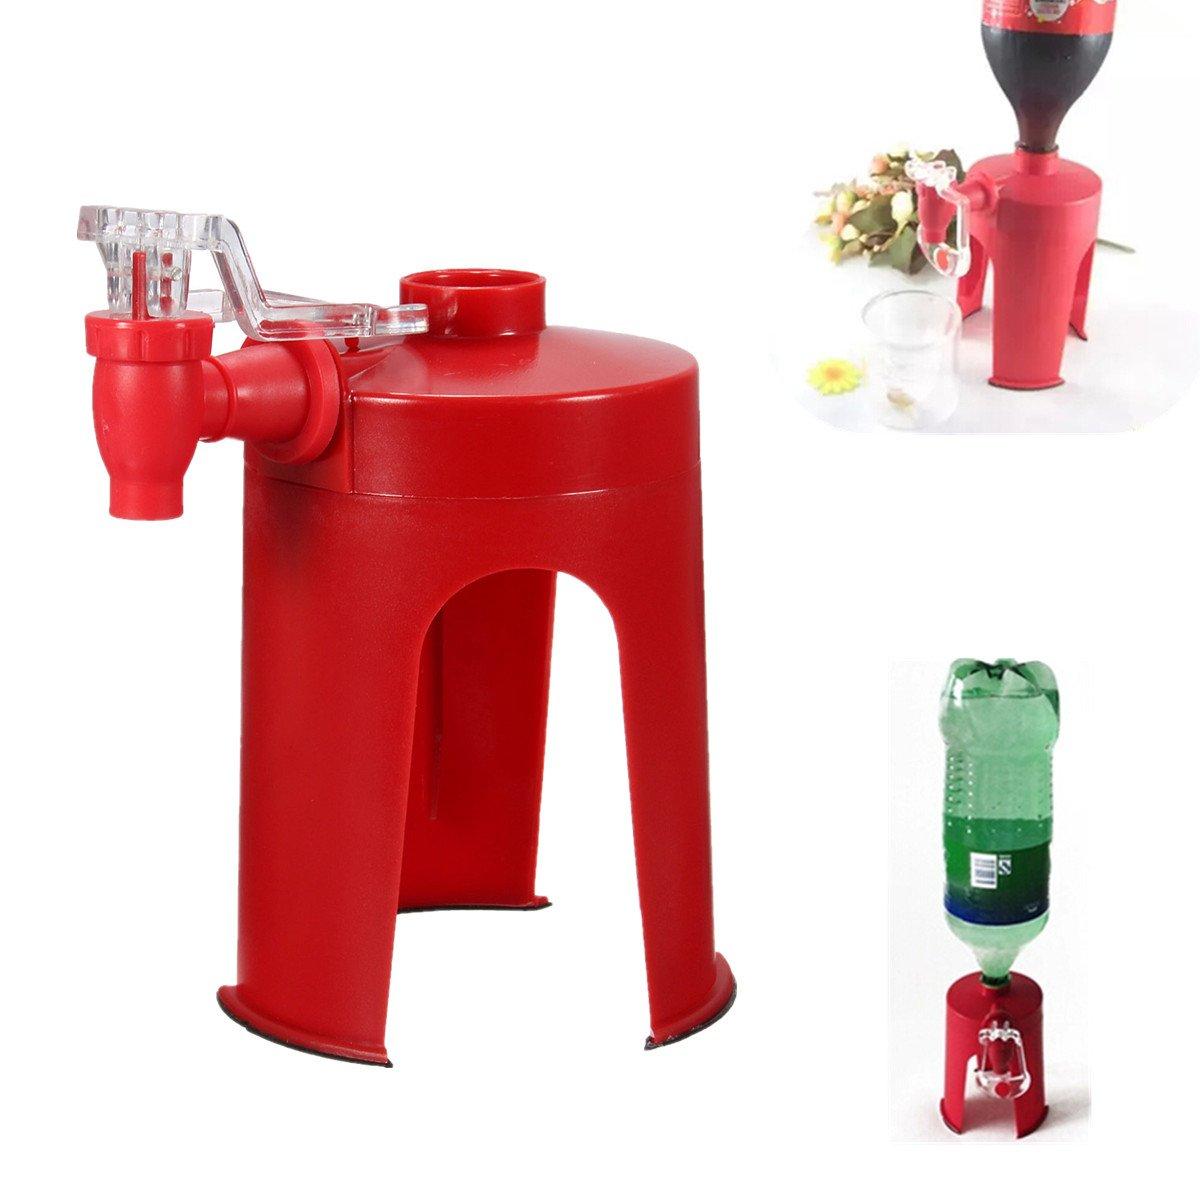 Soda Dispense Gadget Coke Party Drinking Fizz Saver Dispenser Water Machine Tool by Atalanta honesttrade